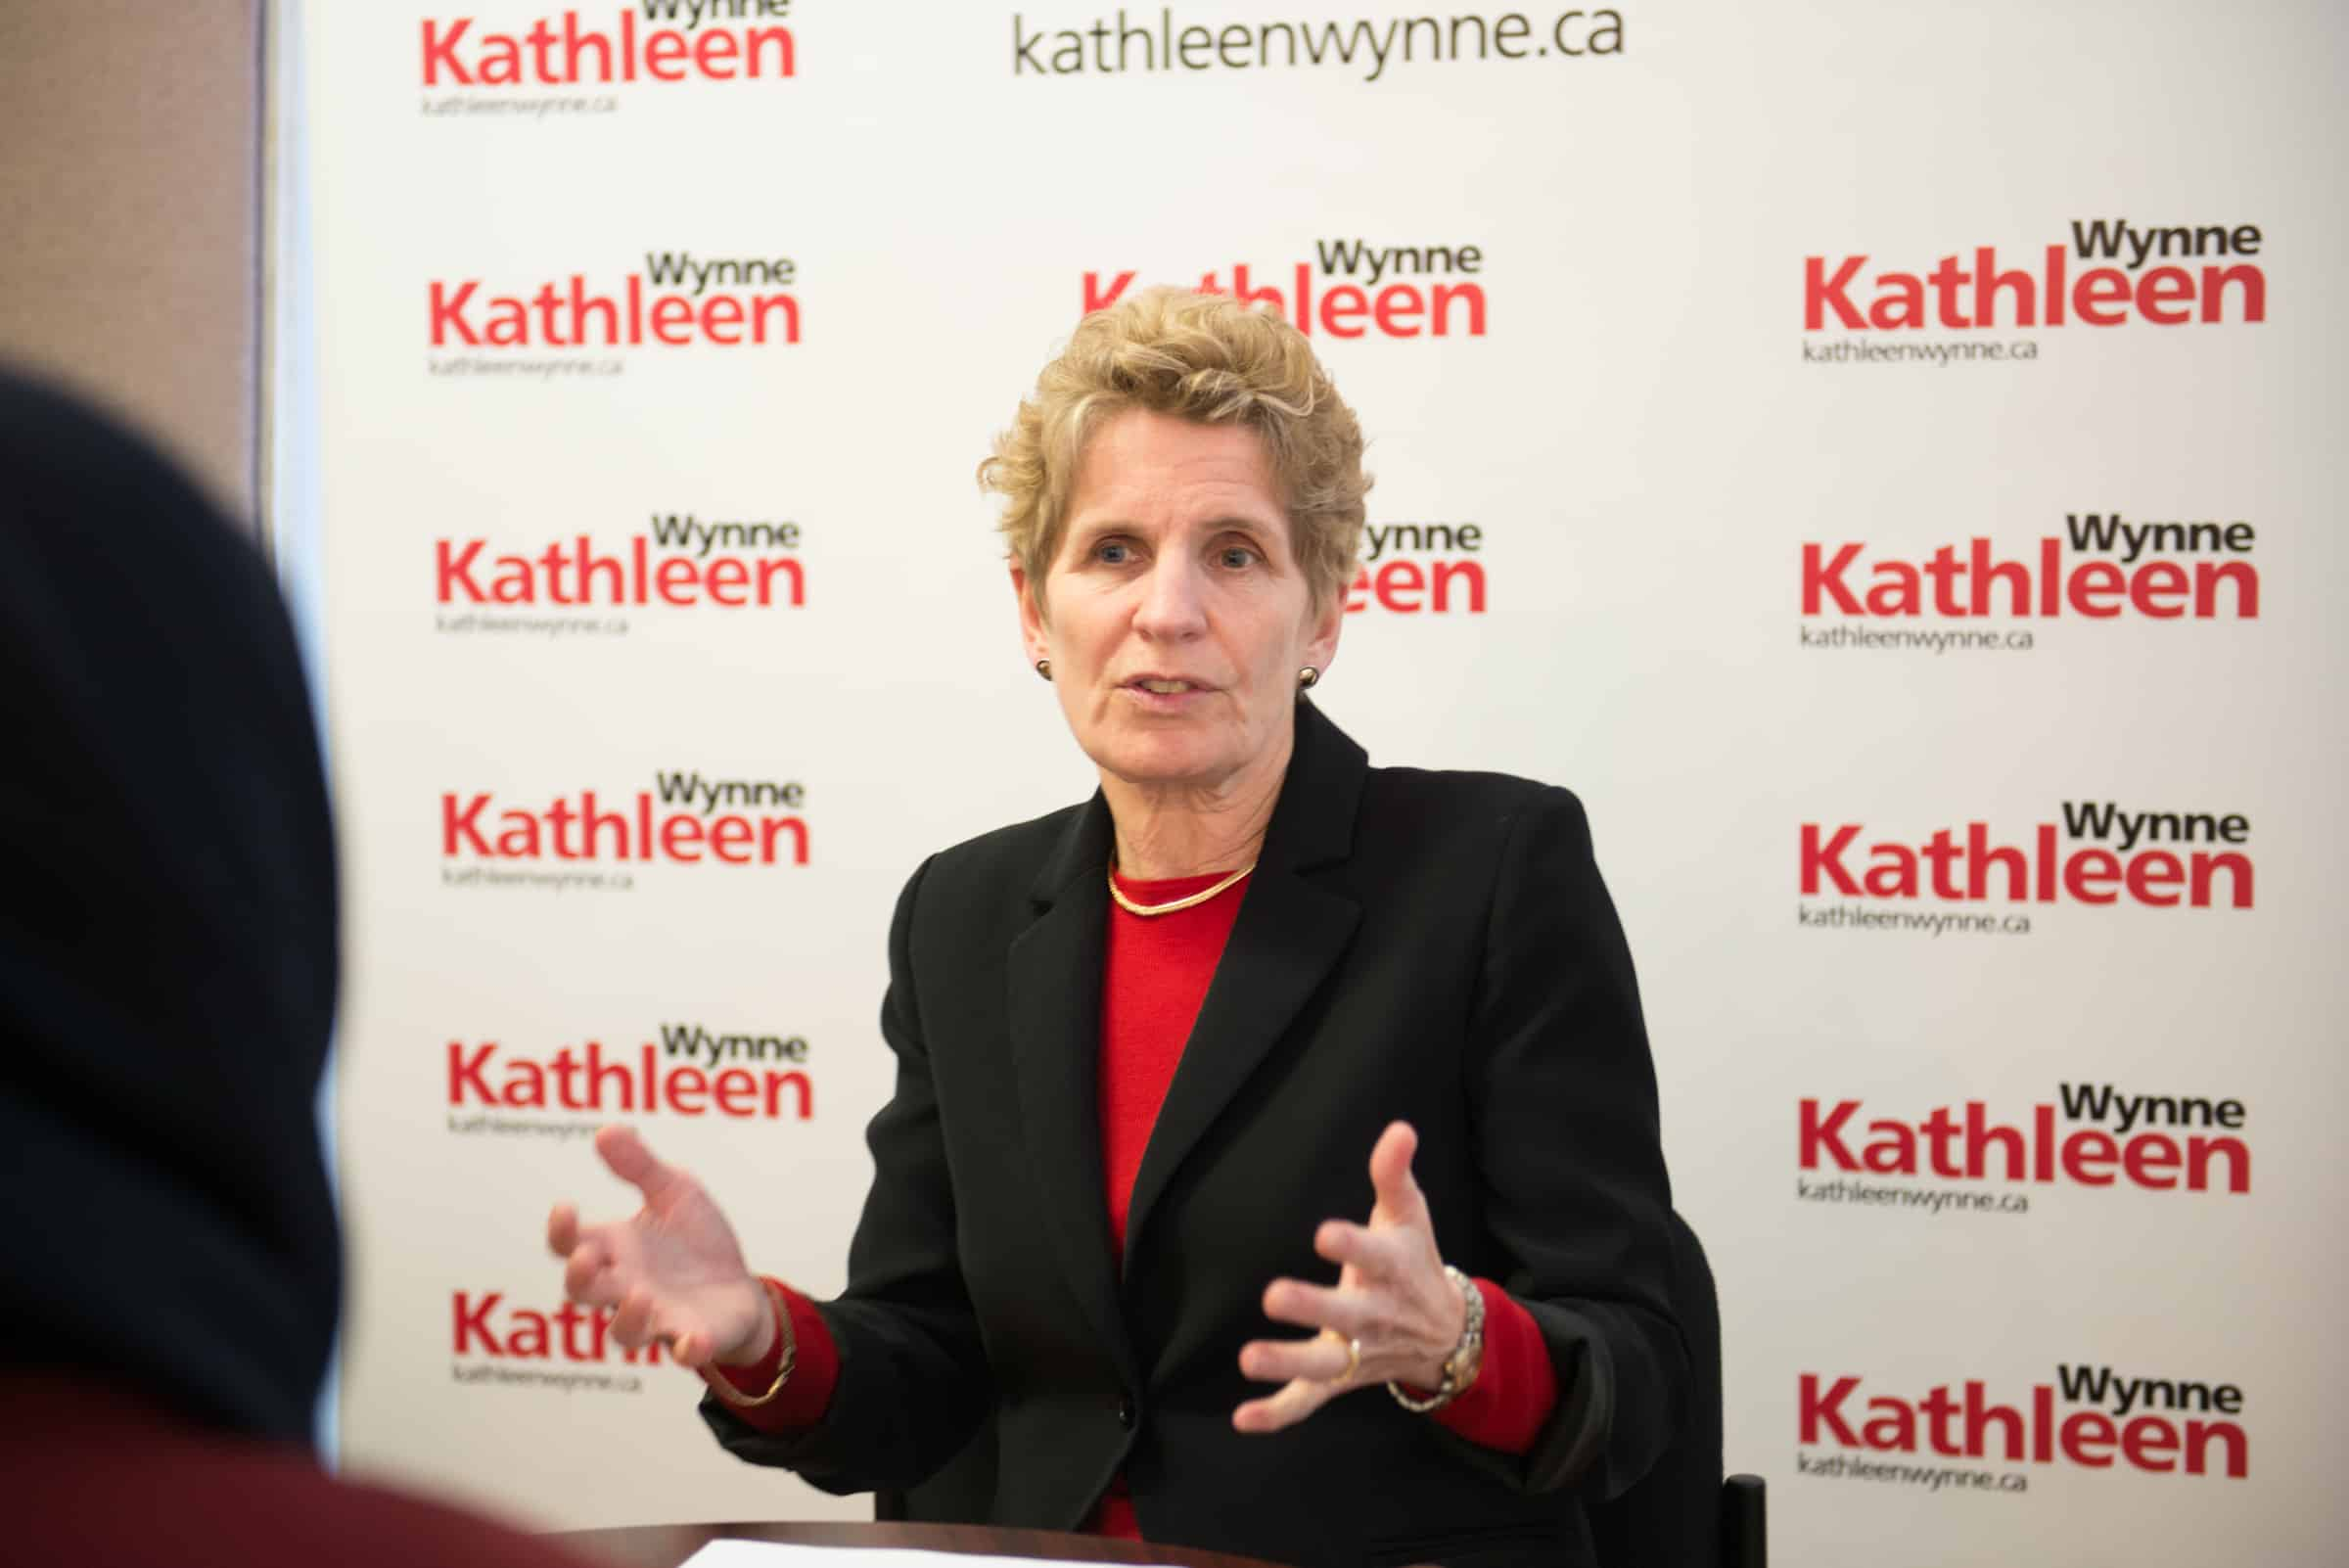 Kathleen Wynne unveils post-secondary education platform